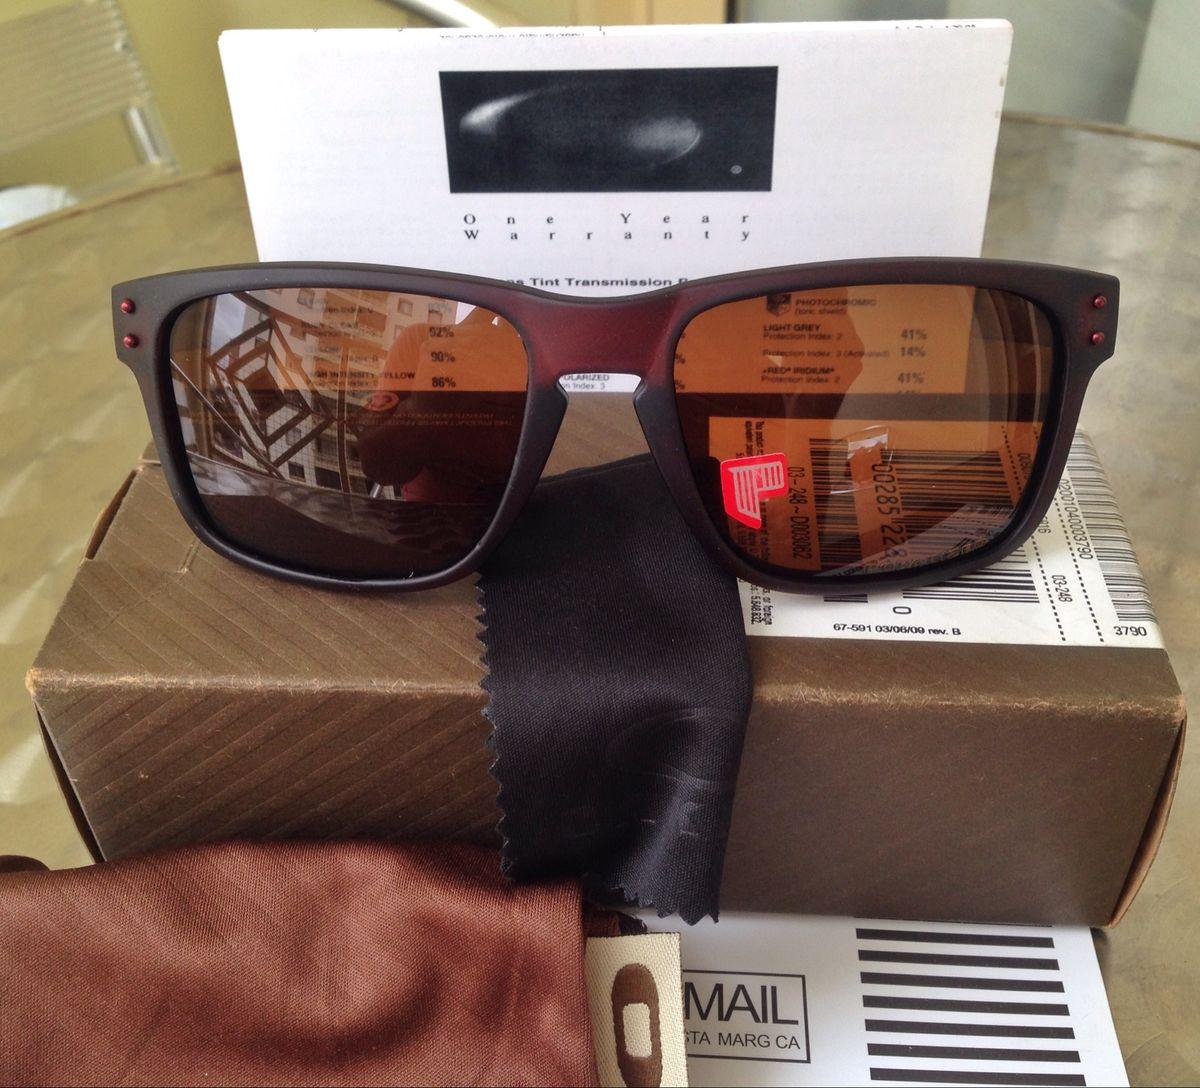 613f6e32ca67d Óculos Oakley Holbrook Polarizado Todo Marrom   Óculos Masculino ...